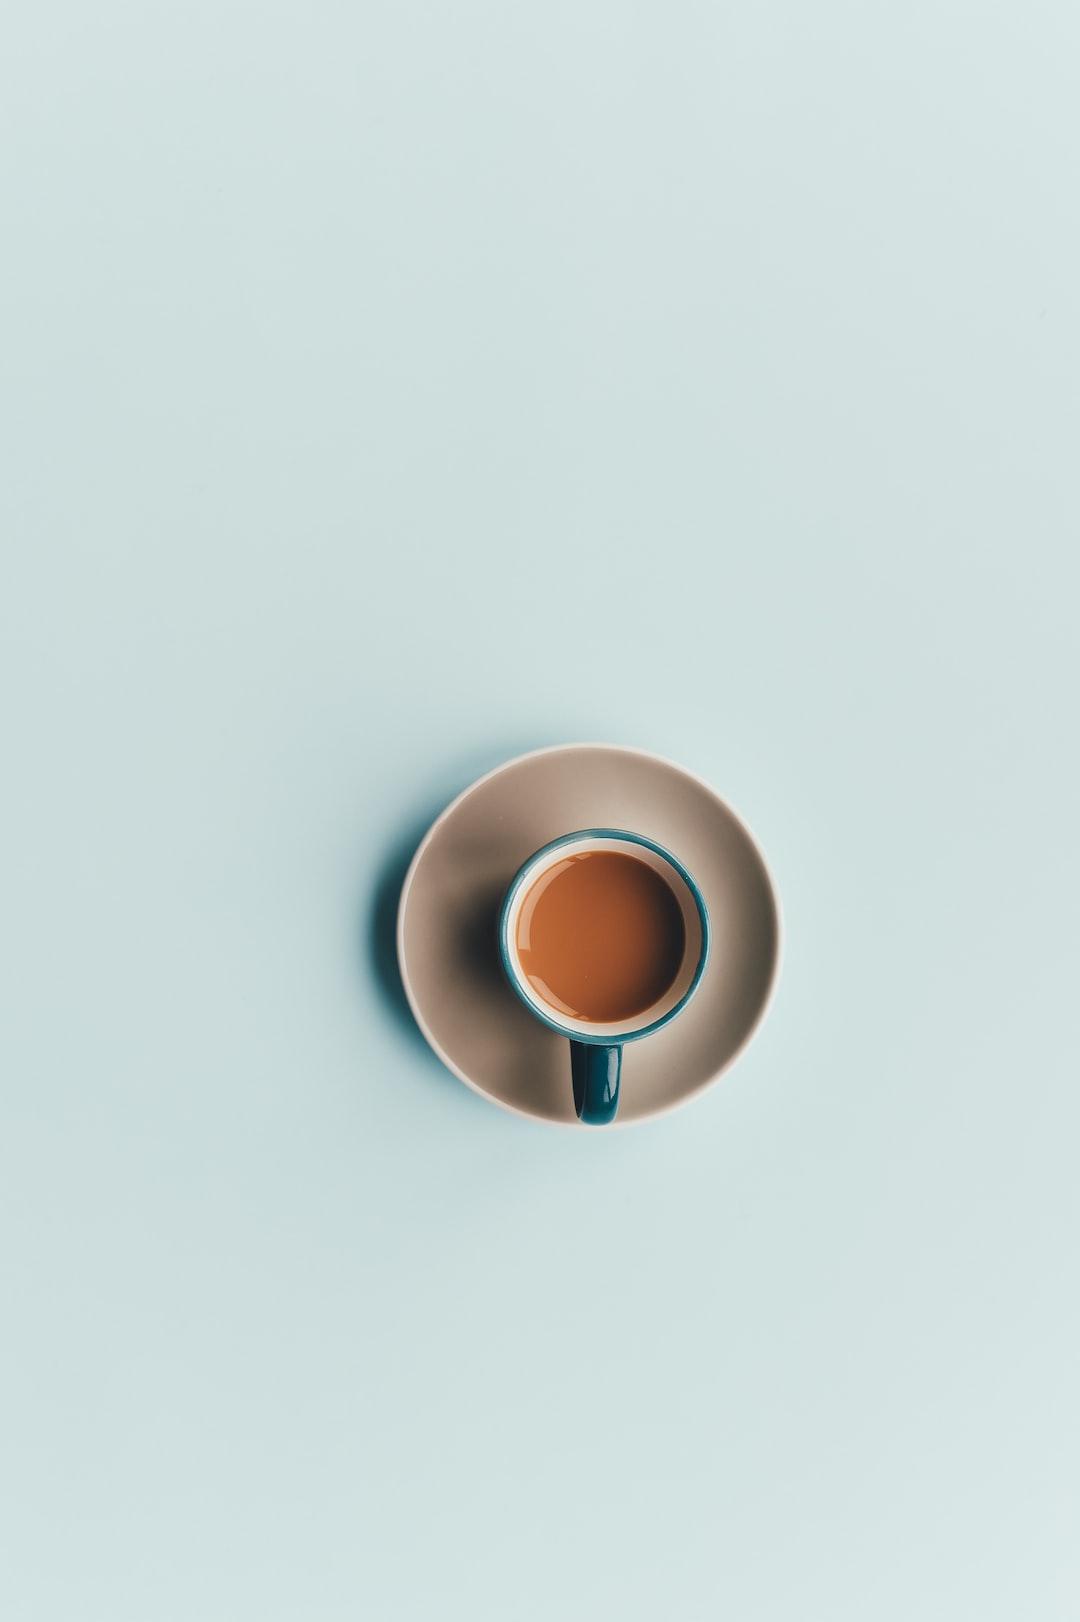 Minimal coffee cup